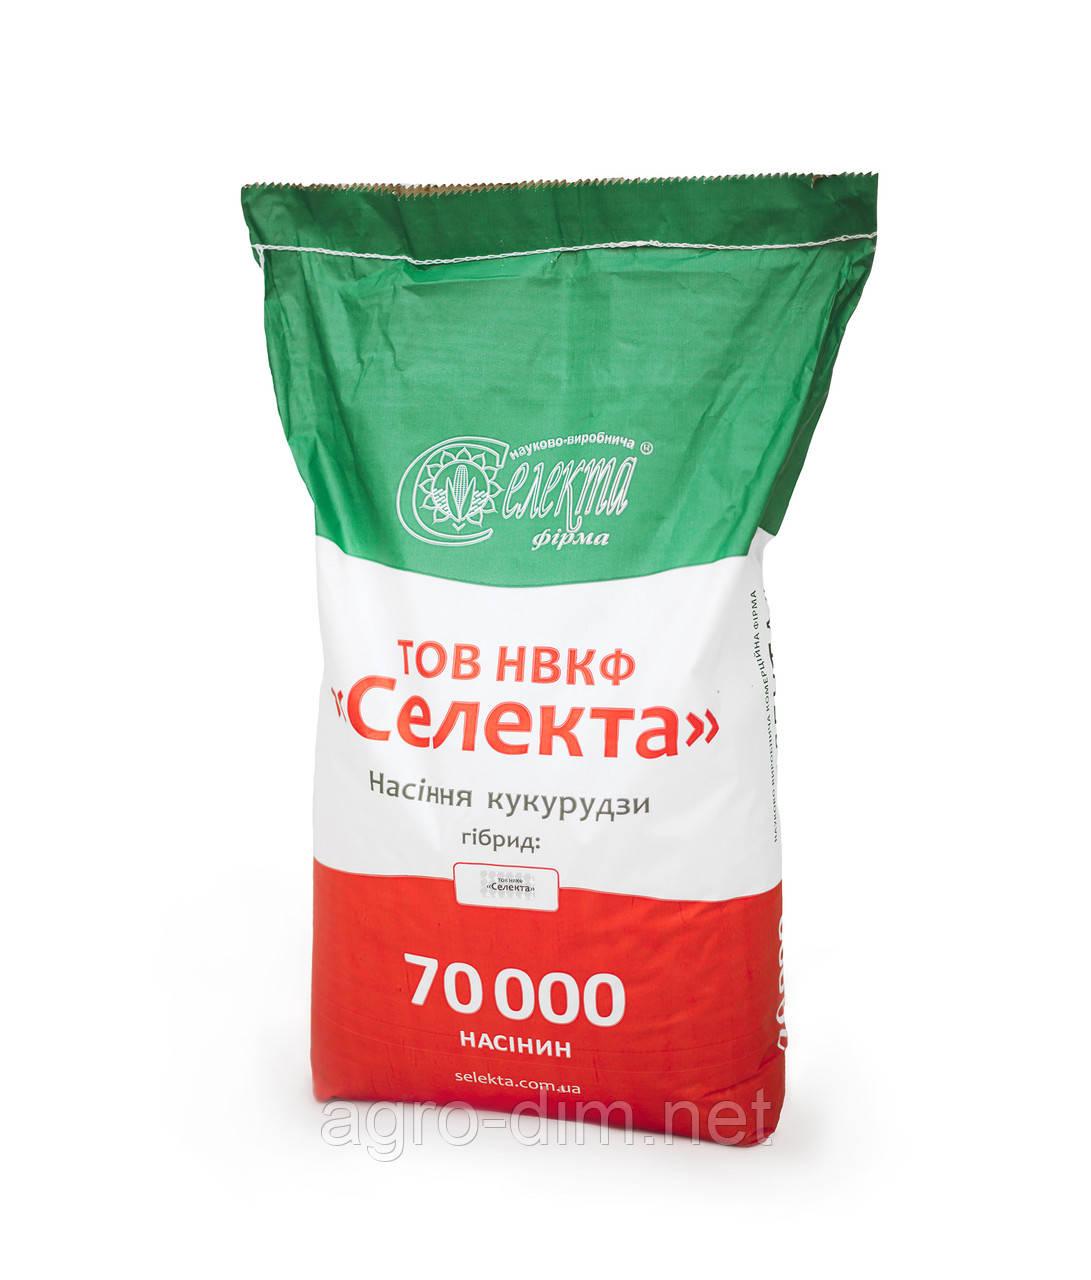 "Семена кукурузы Серенада ТОВ НВКФ ""Селекта"""